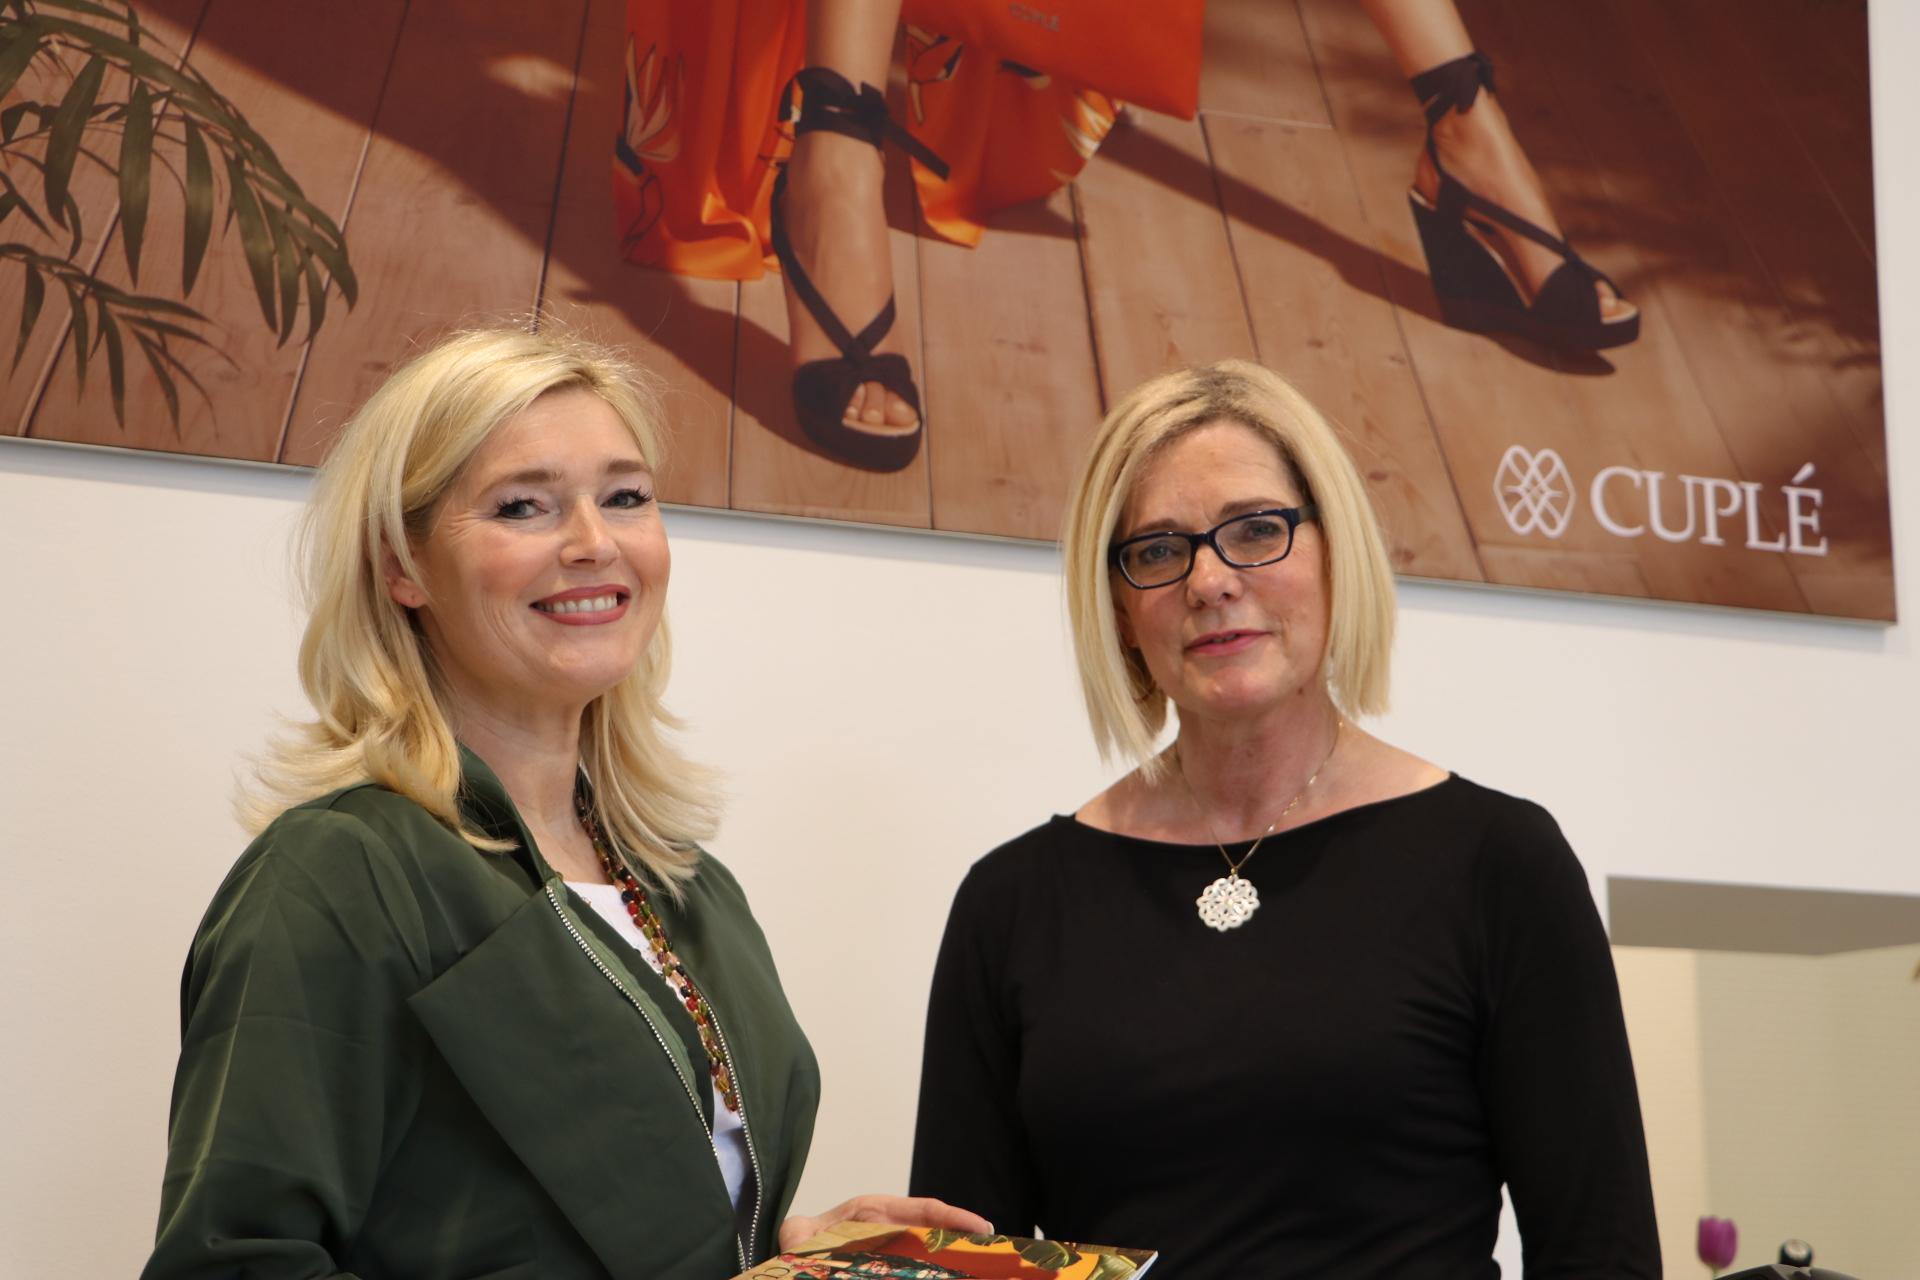 Cuplé Düsseldorf, Cupleduesseldorf, Cuplé Moda, tolle Mode zu bezahlbaren Preisen, Petra Dieners, Gudurn Garces, Fashion-Blog, Lieblingsstil.com,1,